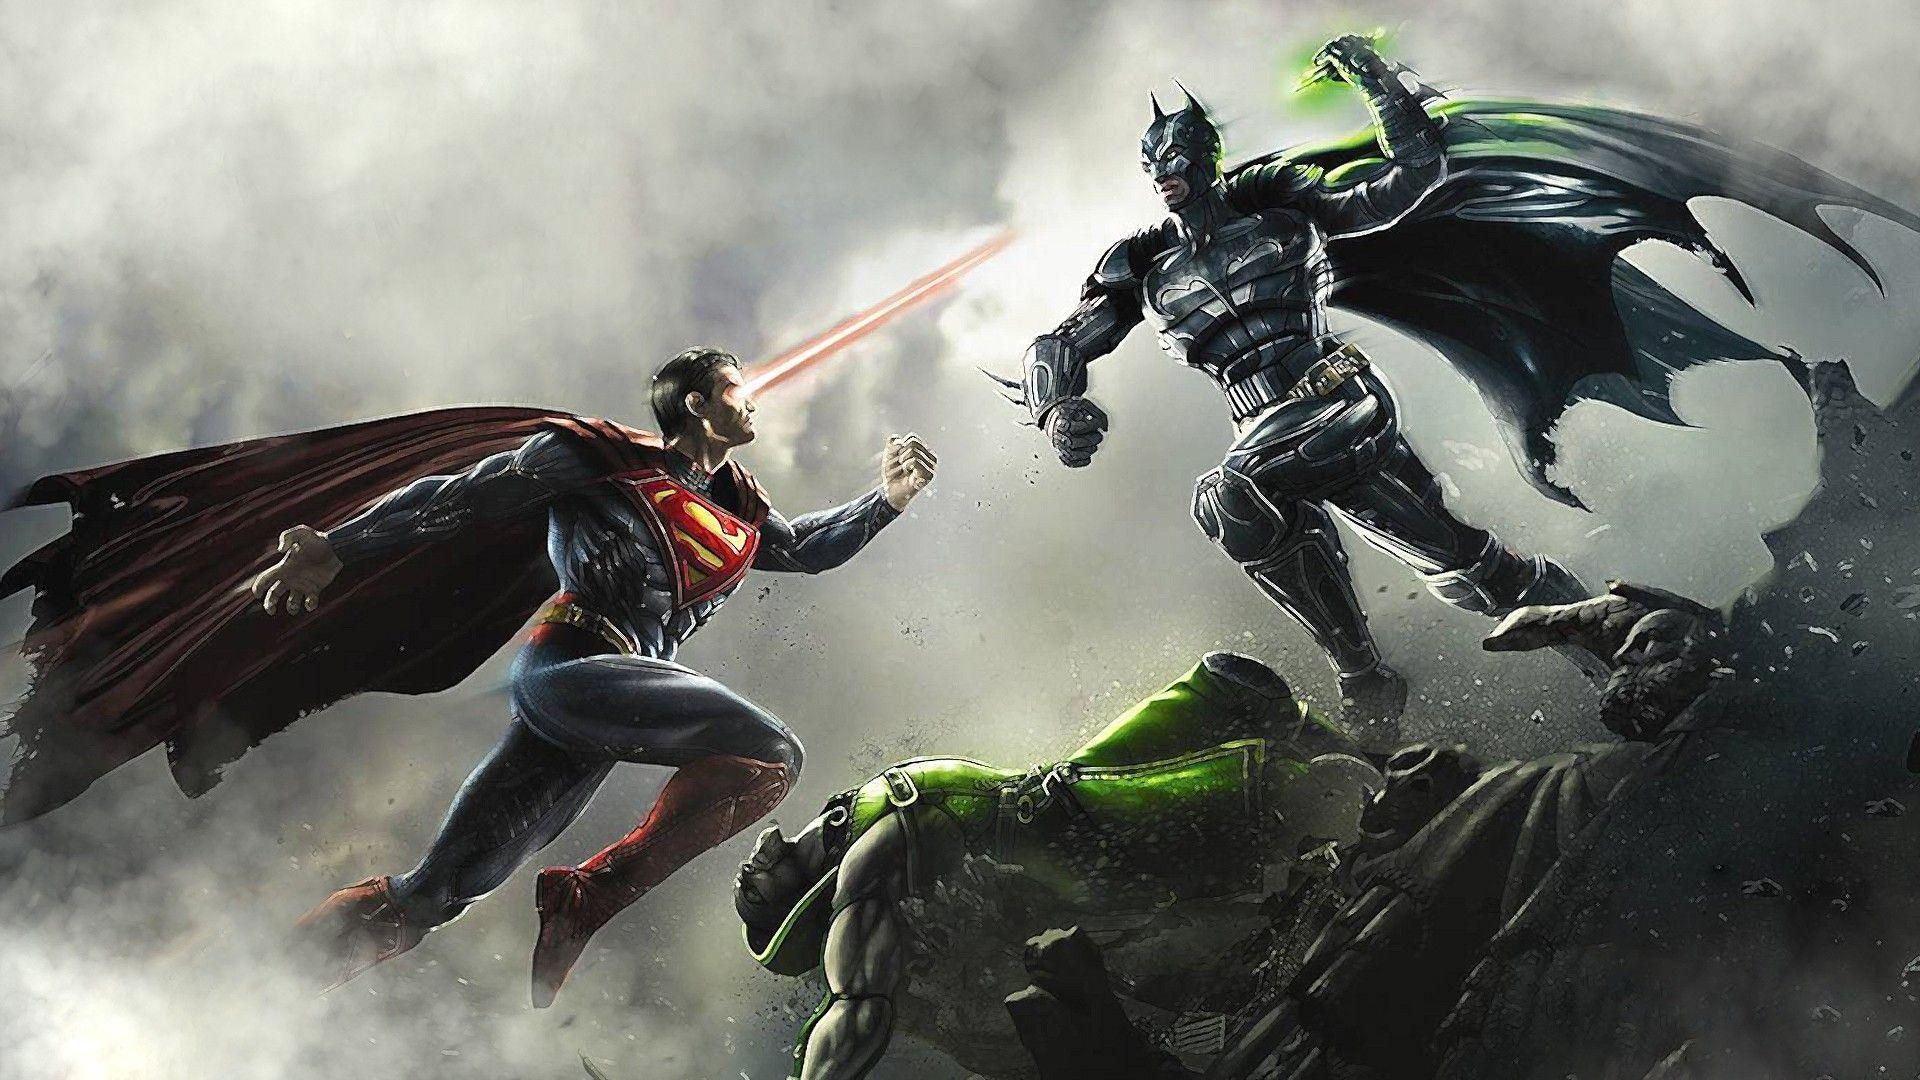 Hd wallpaper superman - Superman Hd Wallpaper Http Anime Riseable Club 2016 01